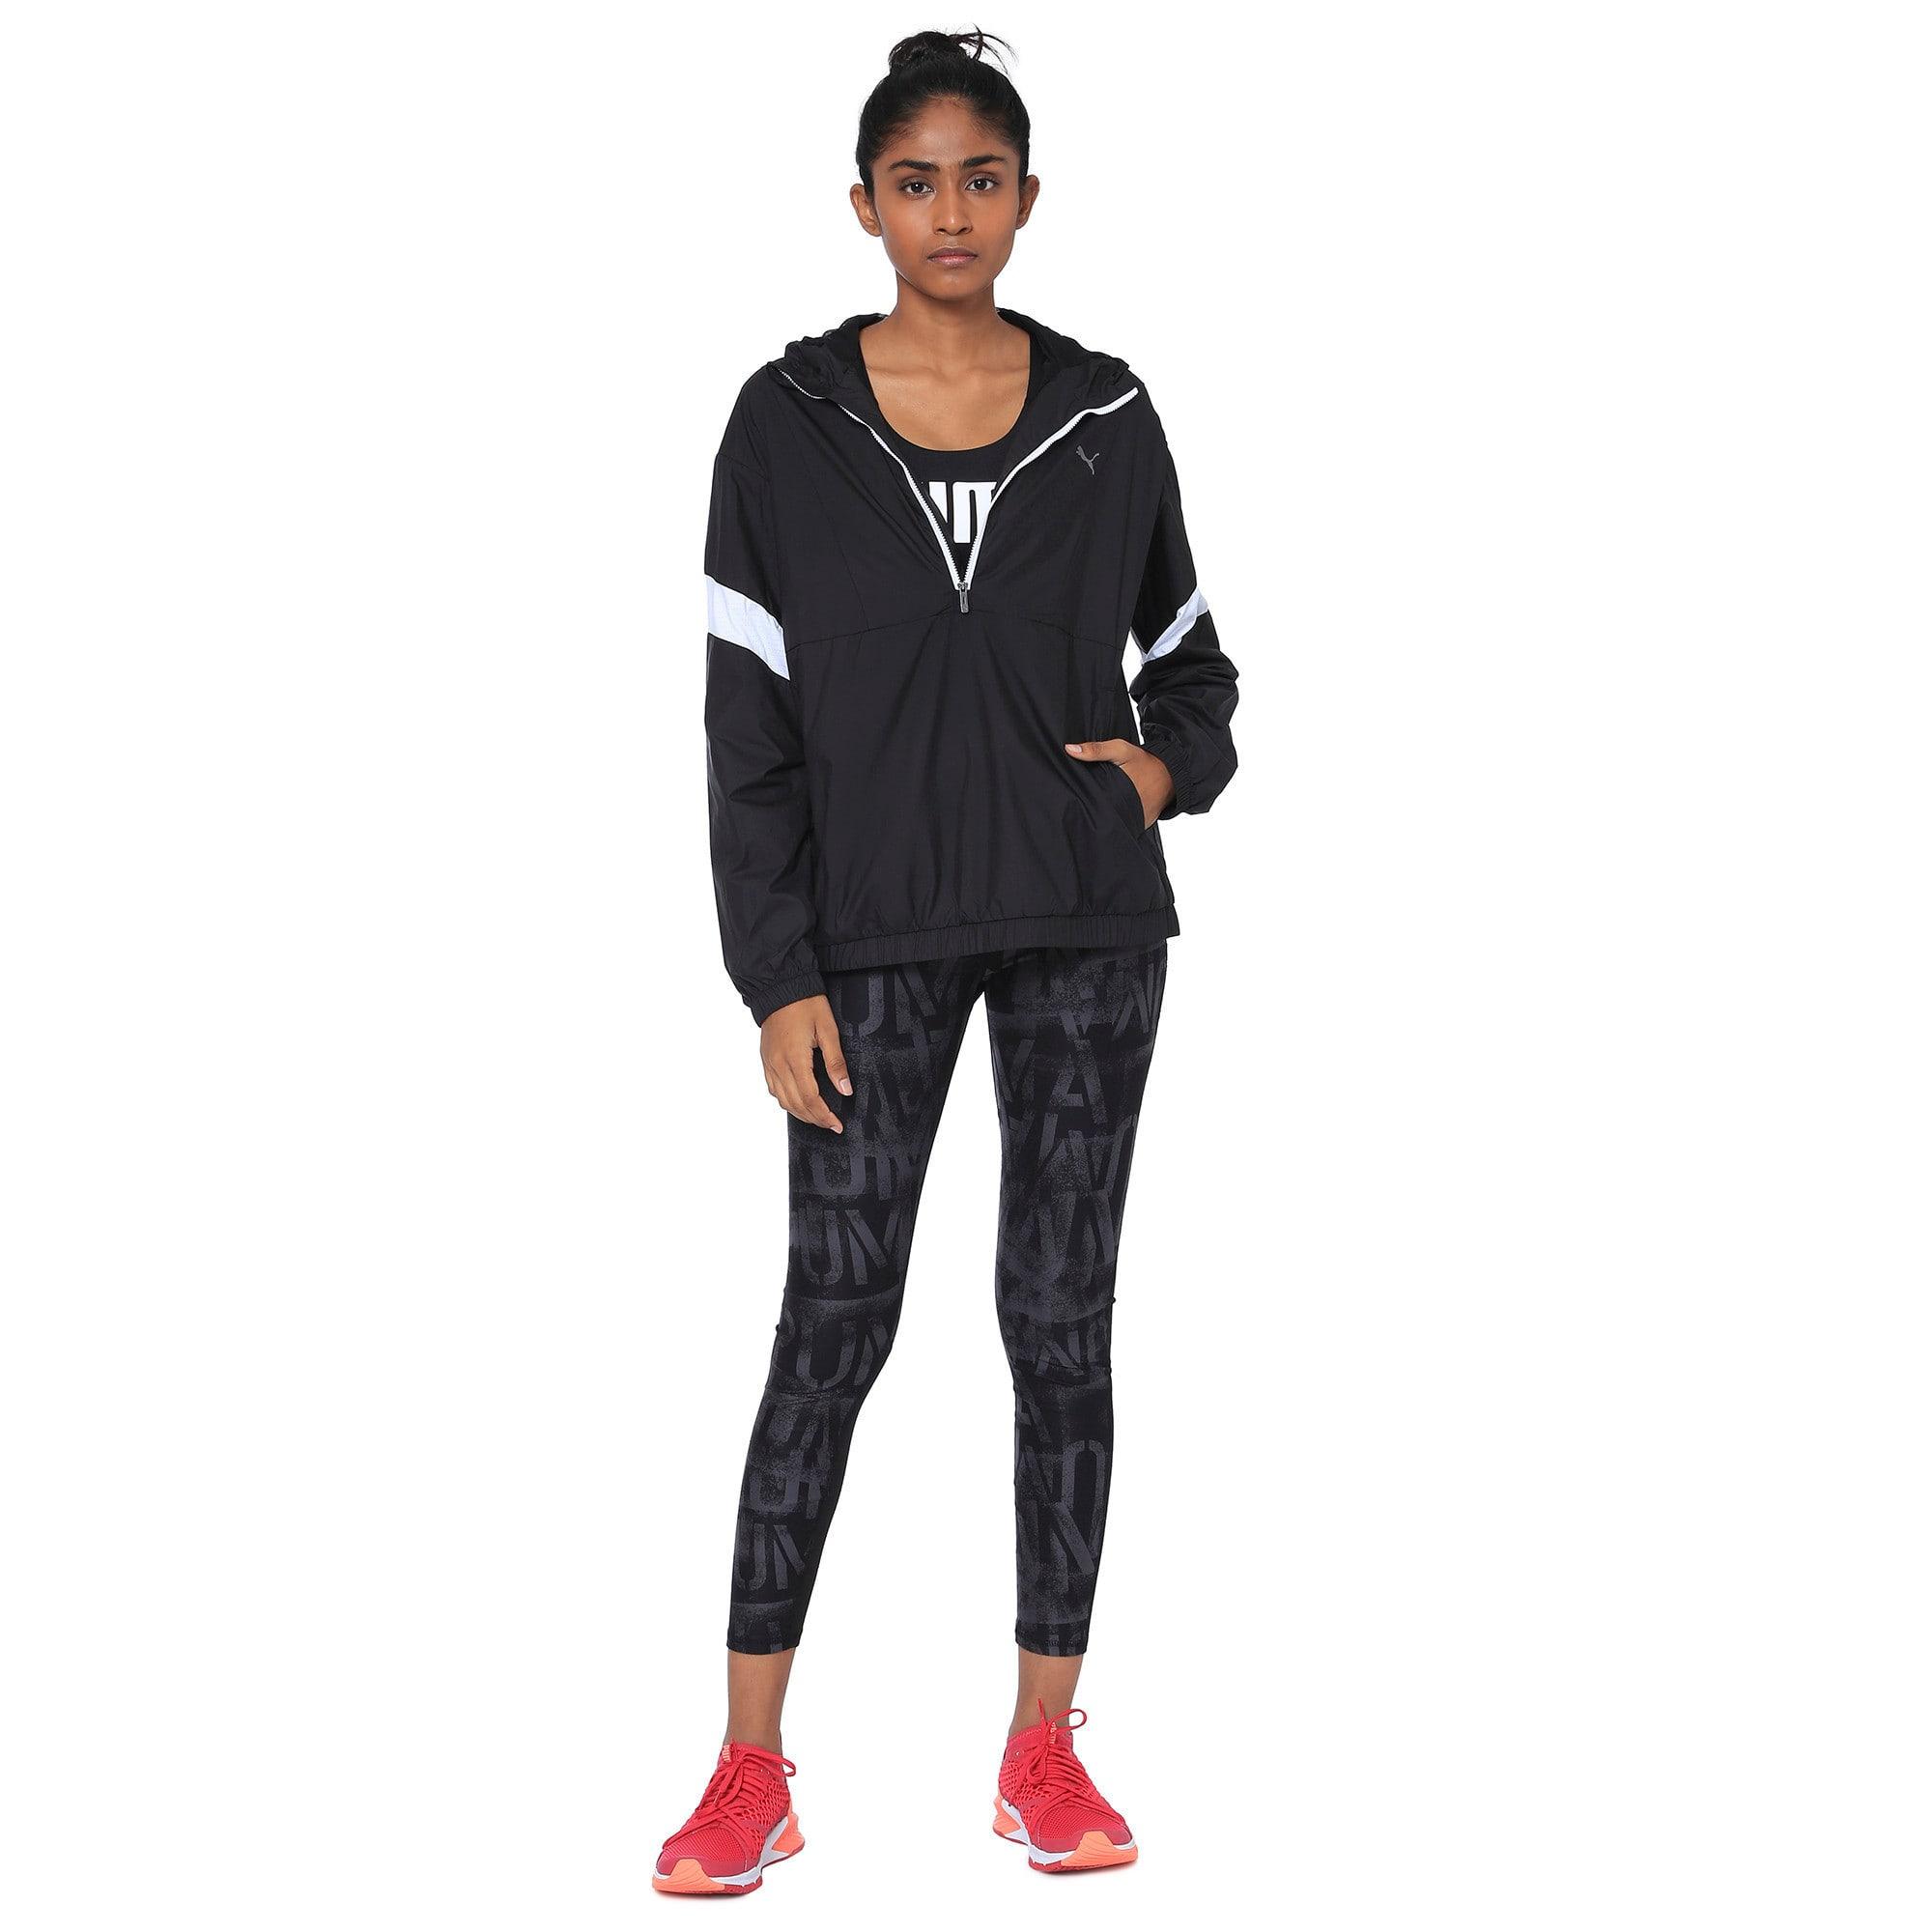 Thumbnail 2 of A.C.E Half Zip Hooded Women's Jacket, Puma Black-Puma White, medium-IND